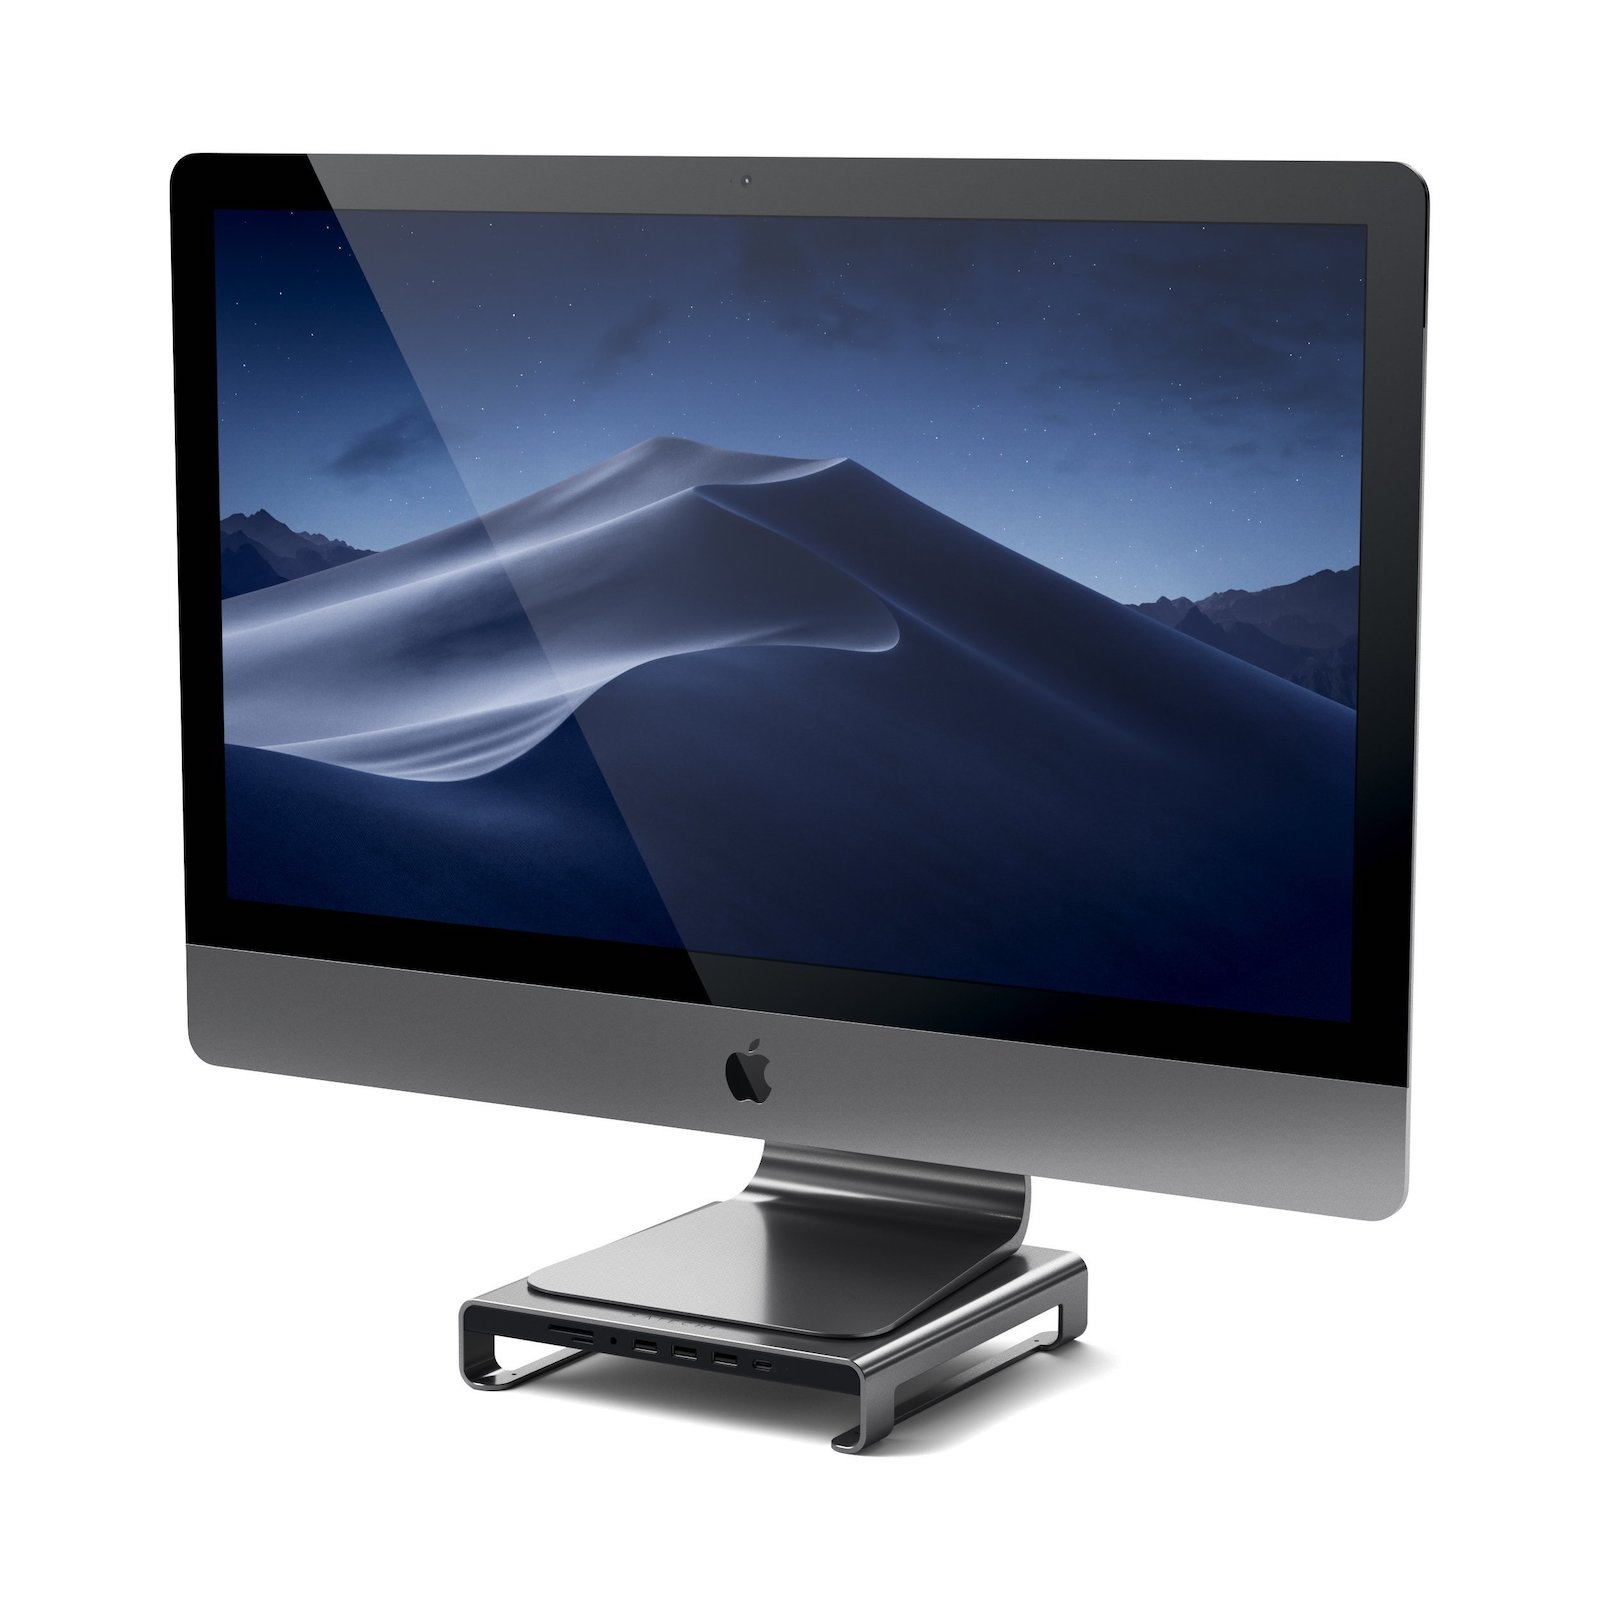 SATECHI iMac Stand SPACEGRAY 9